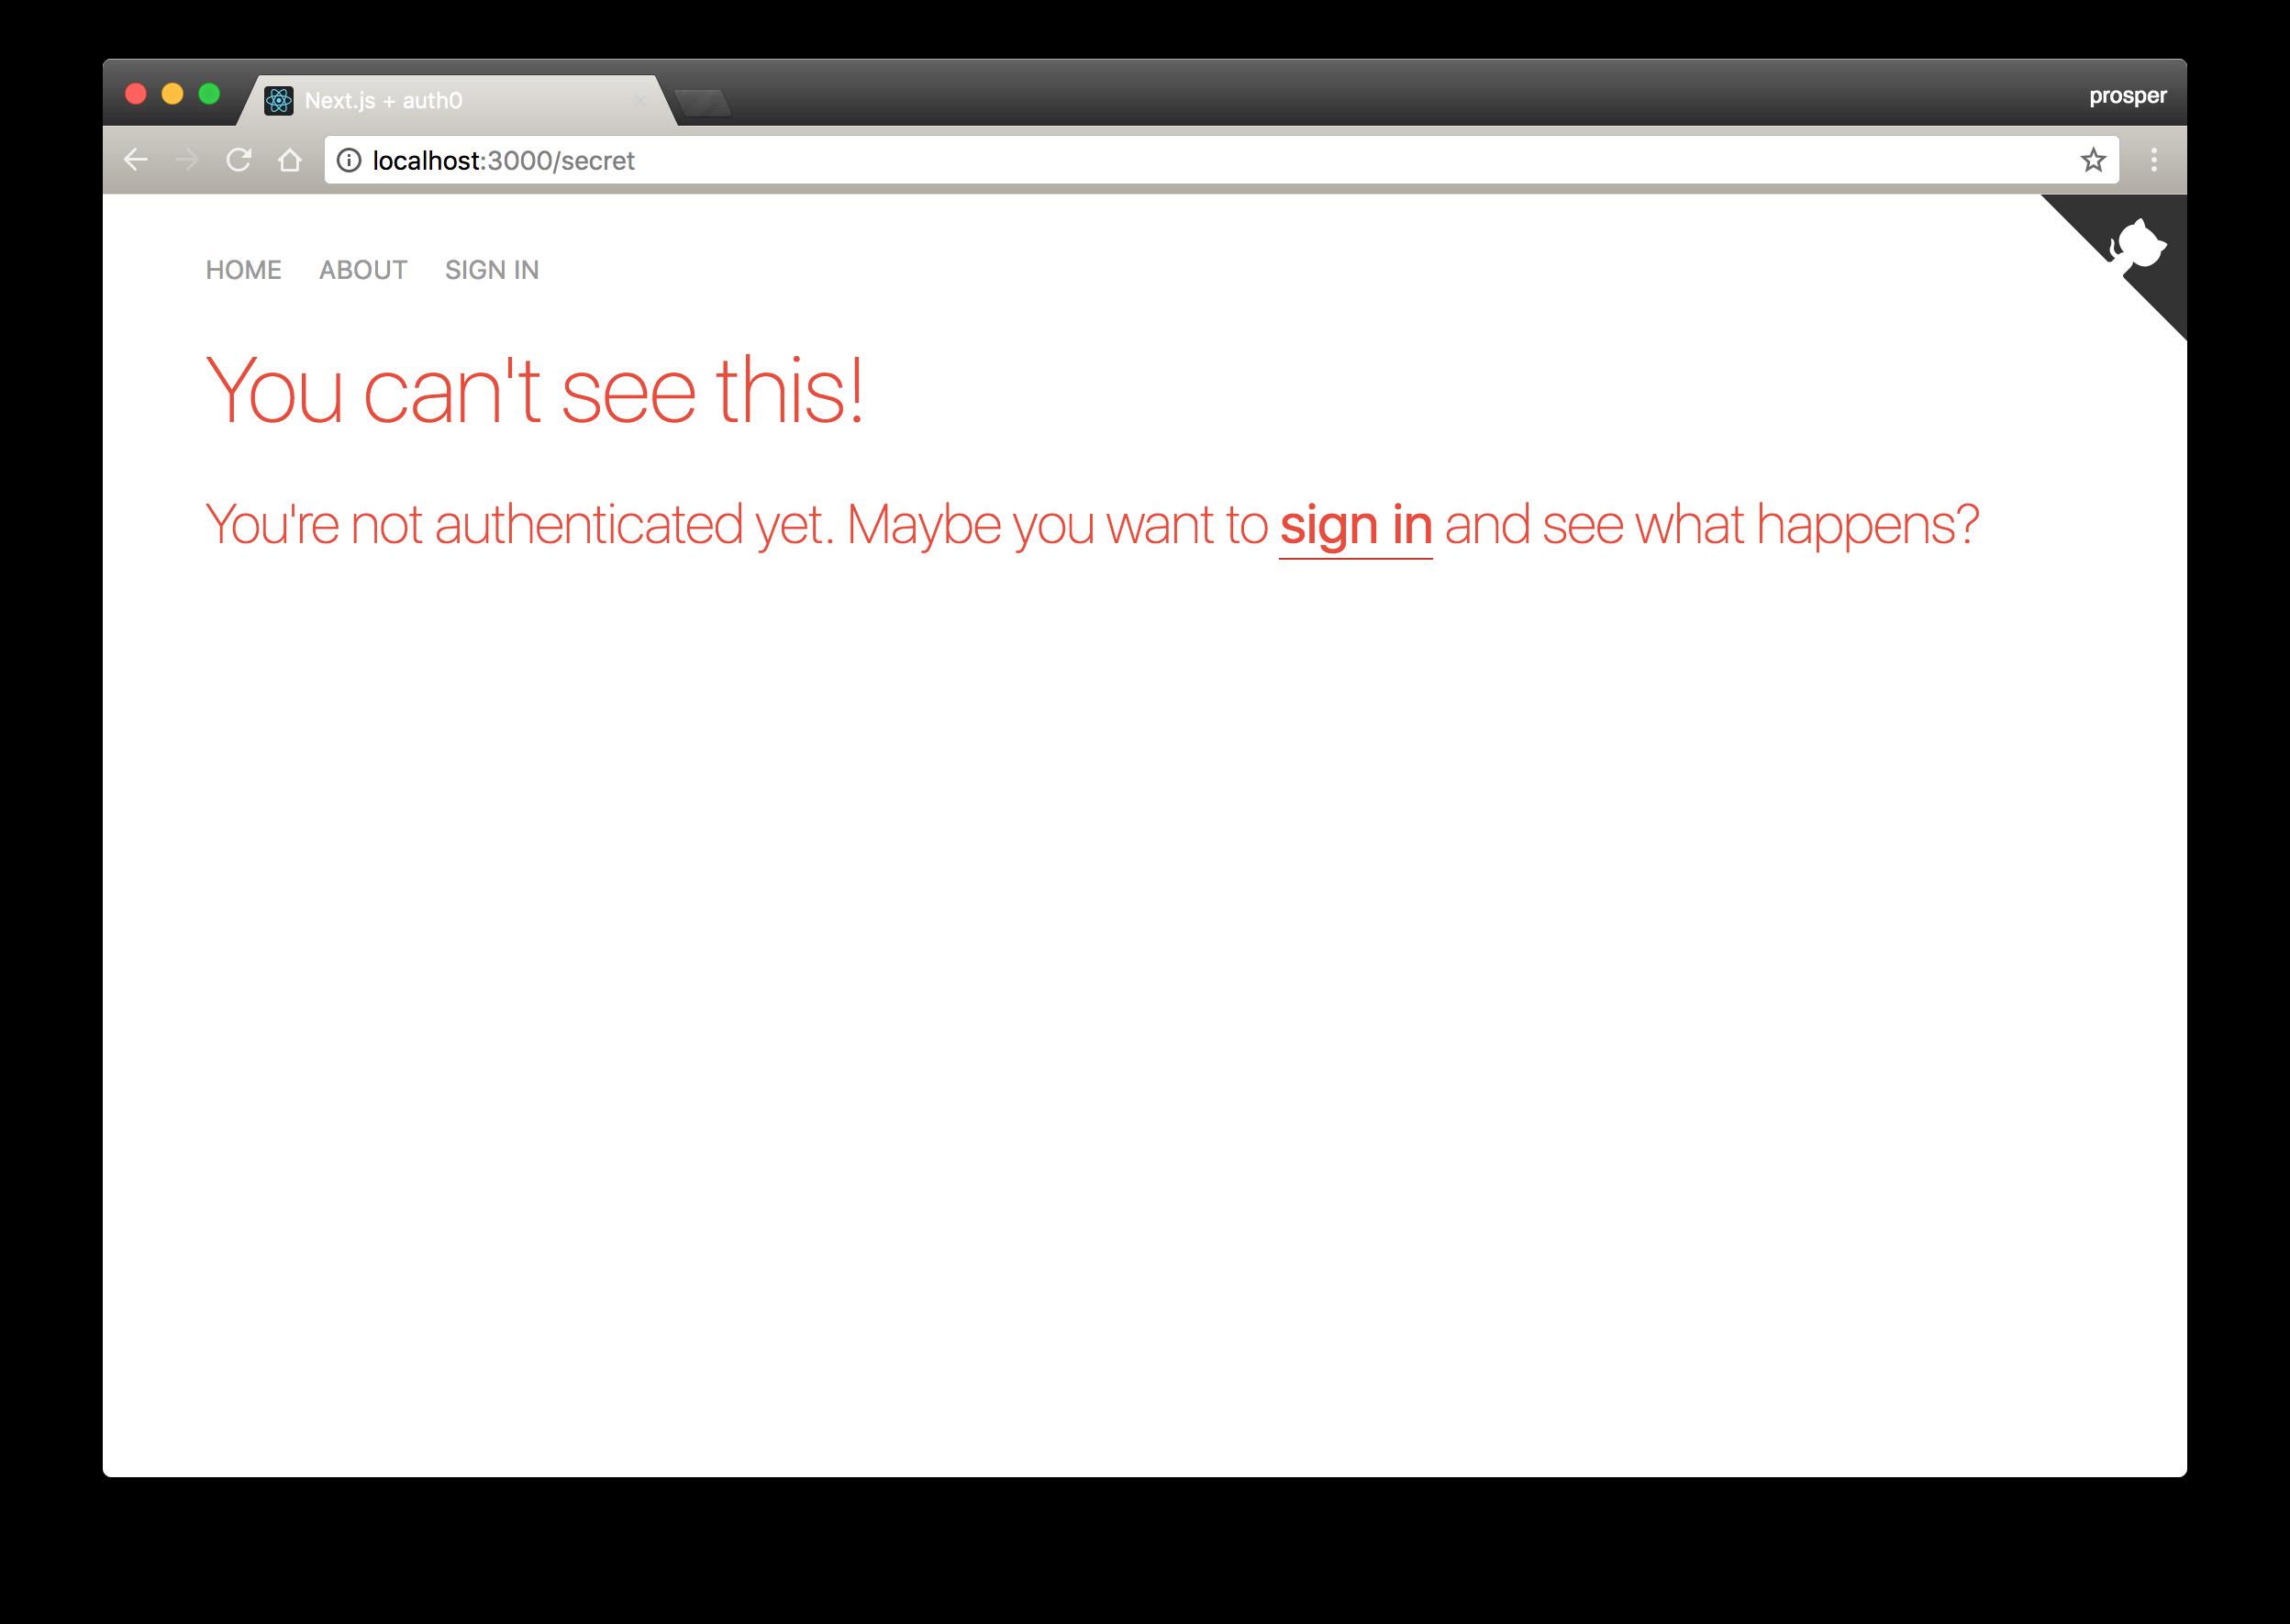 Secret page unauthorized